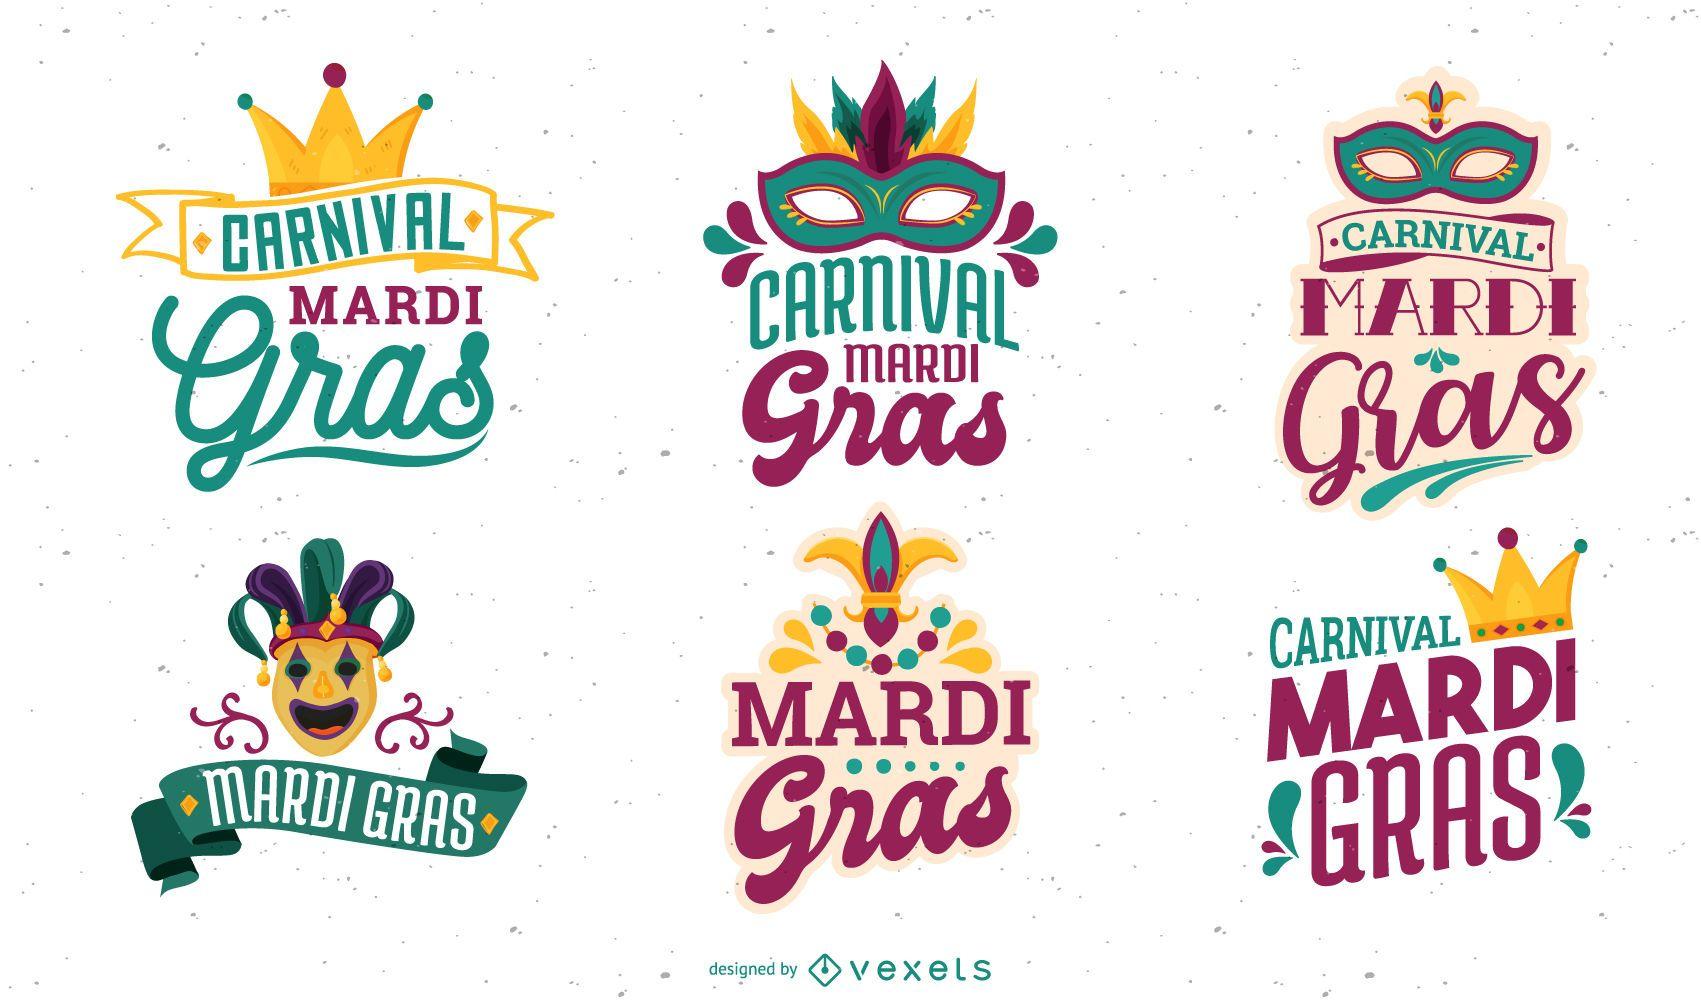 Design de letras do carnaval Mardi Gras